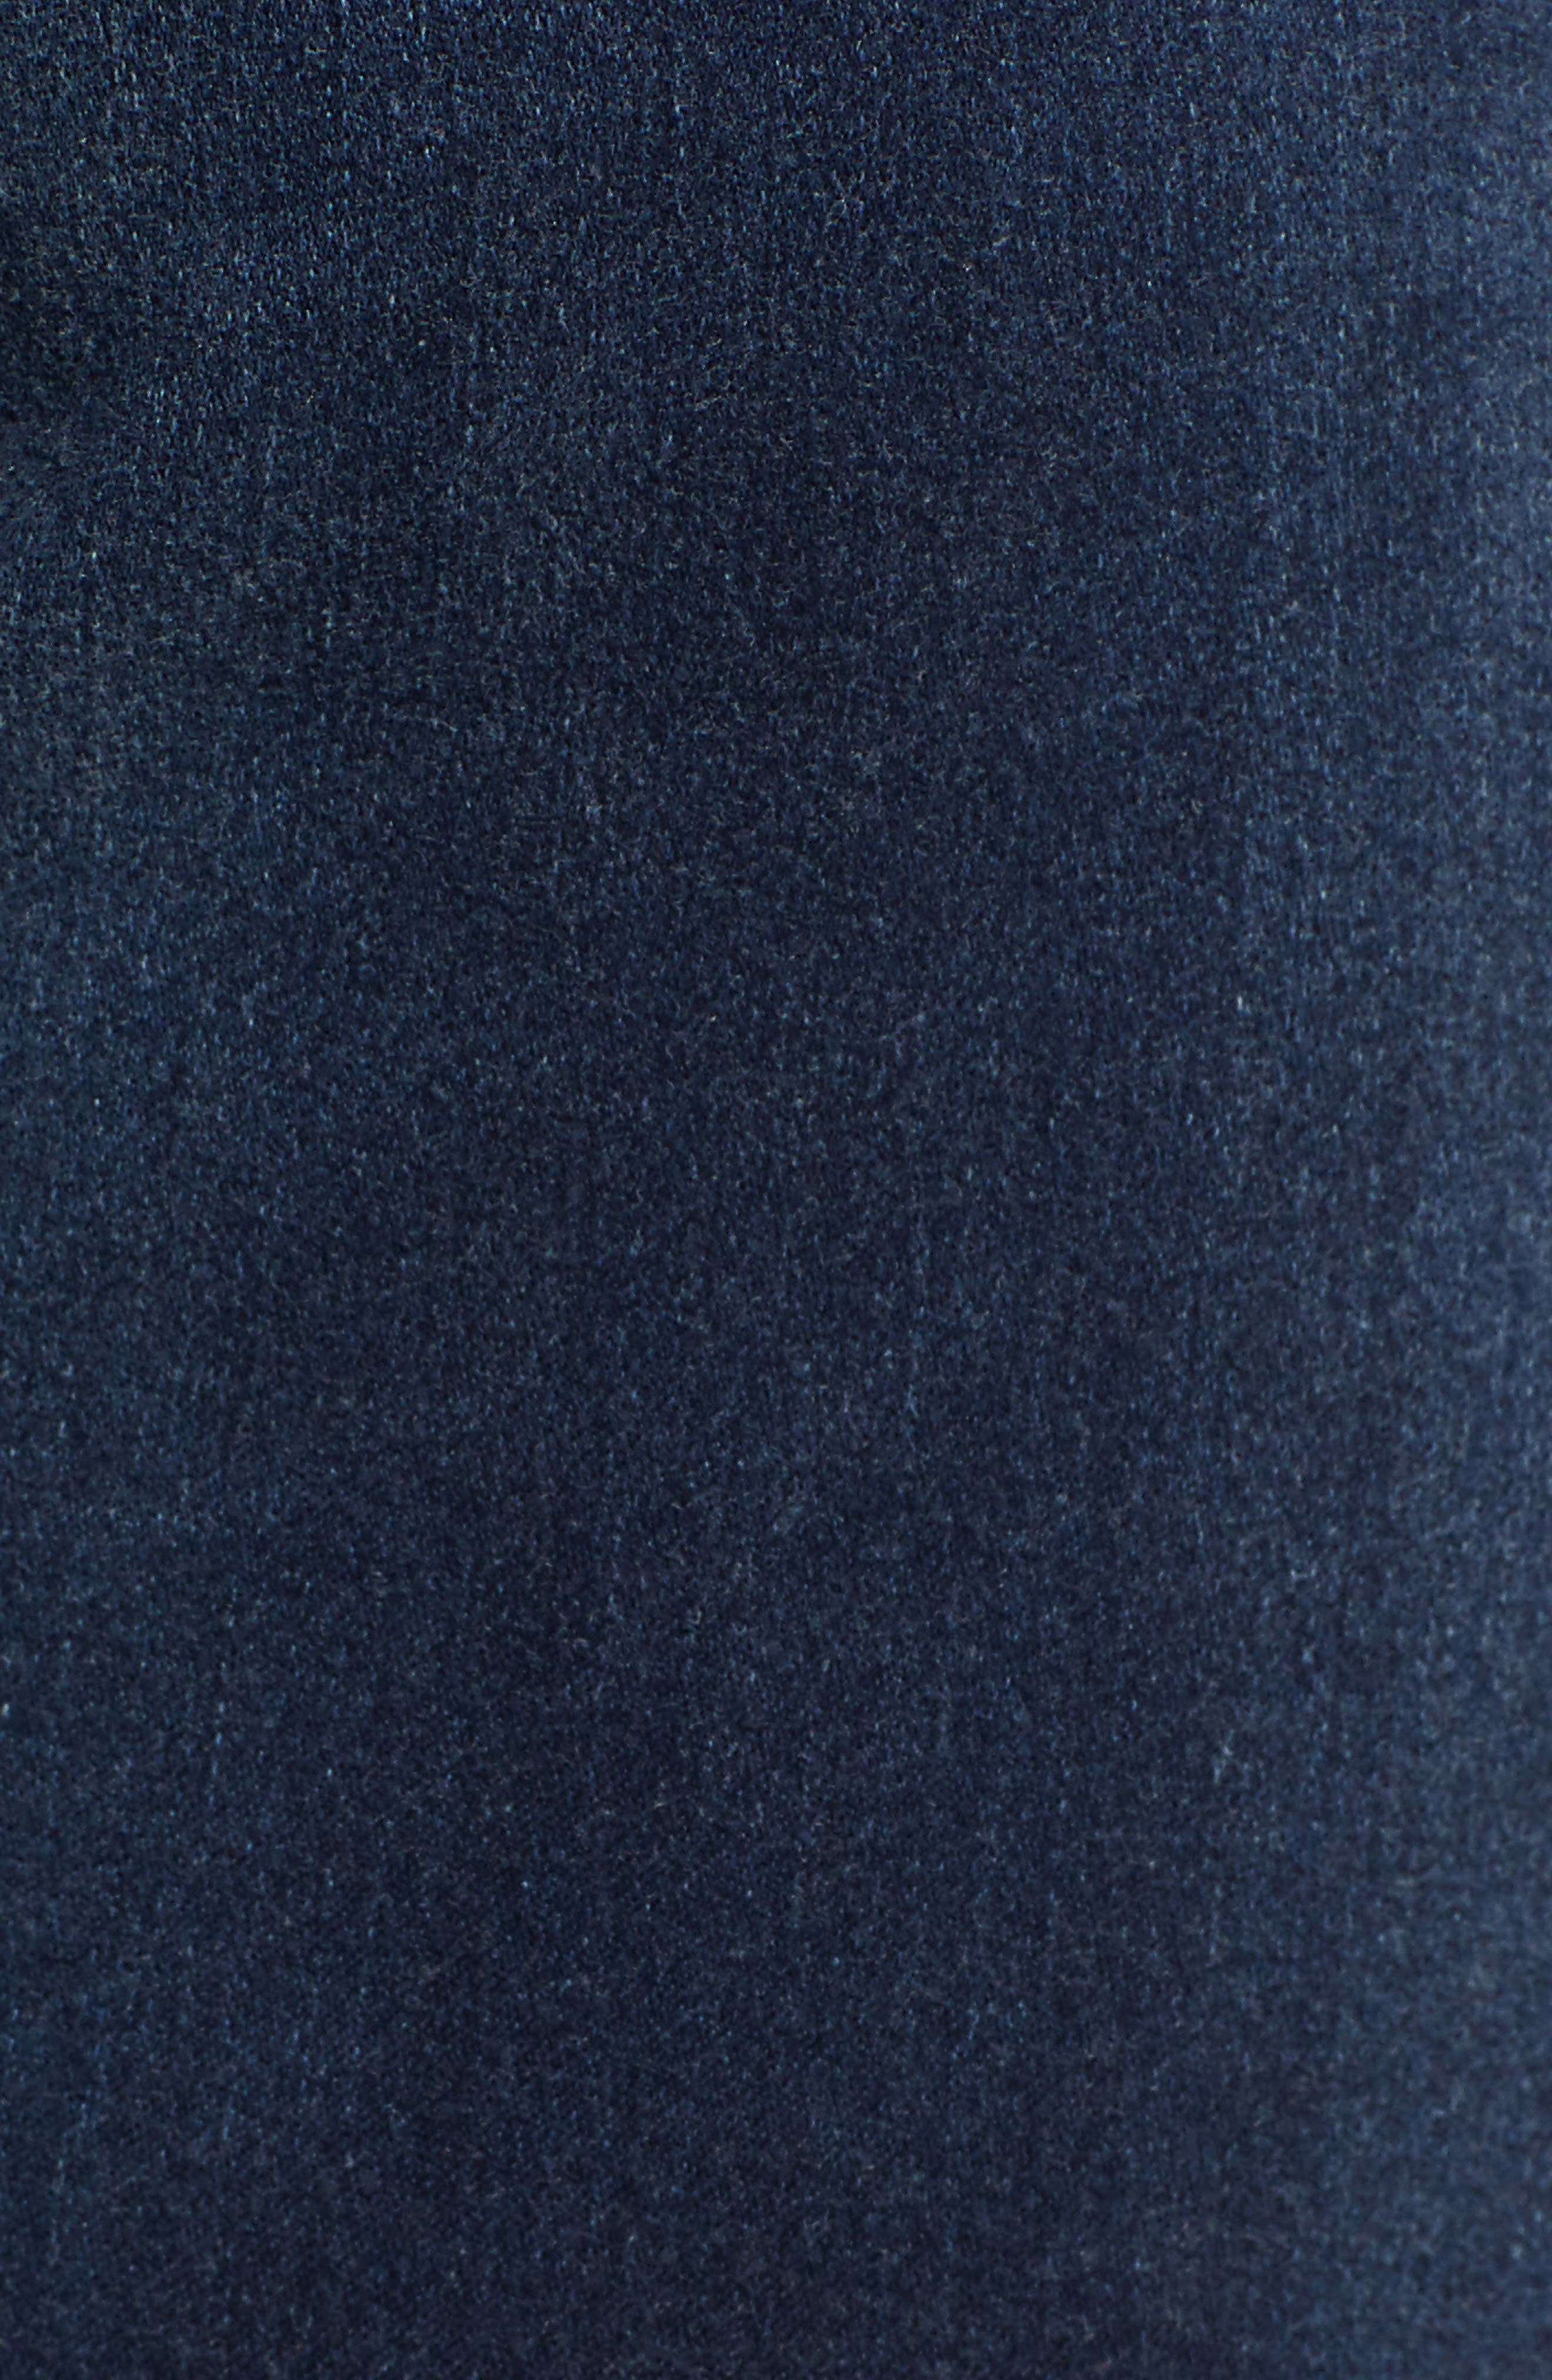 Diana Skinny Jeans,                             Alternate thumbnail 6, color,                             ART W/ EURO BASE WASH